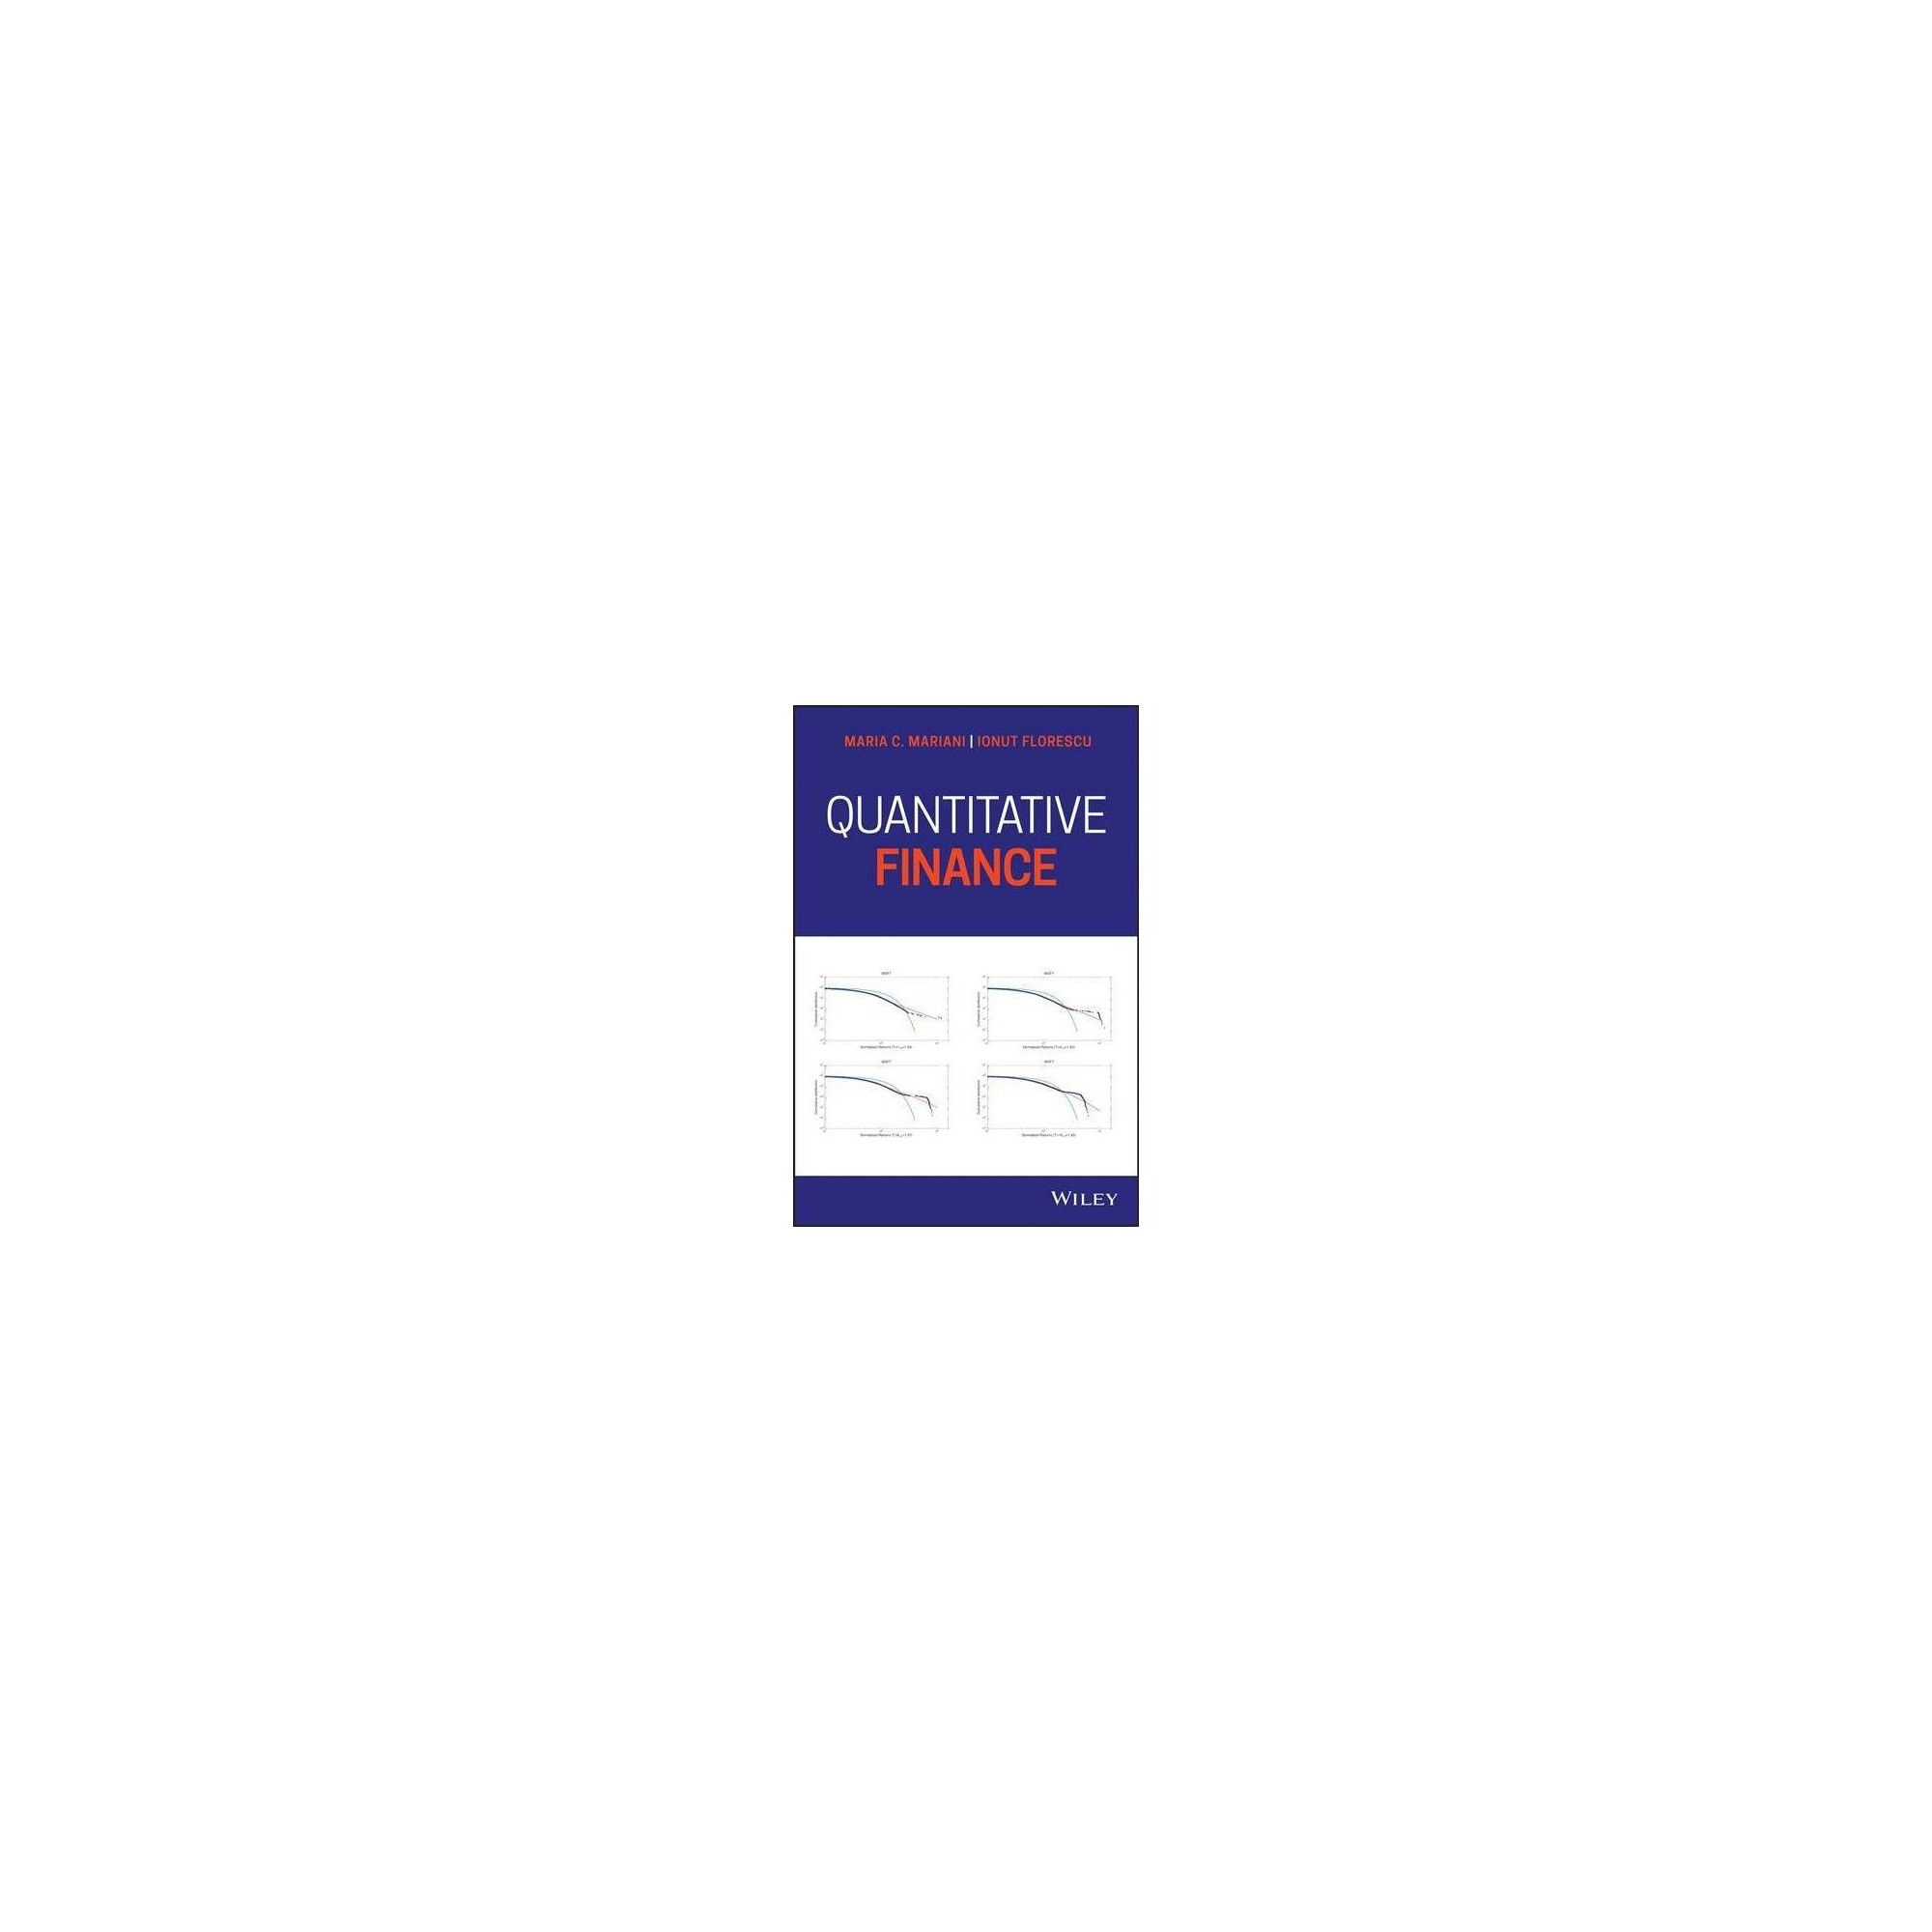 Quantitative Finance - (Statistics in Practice) by Ionut